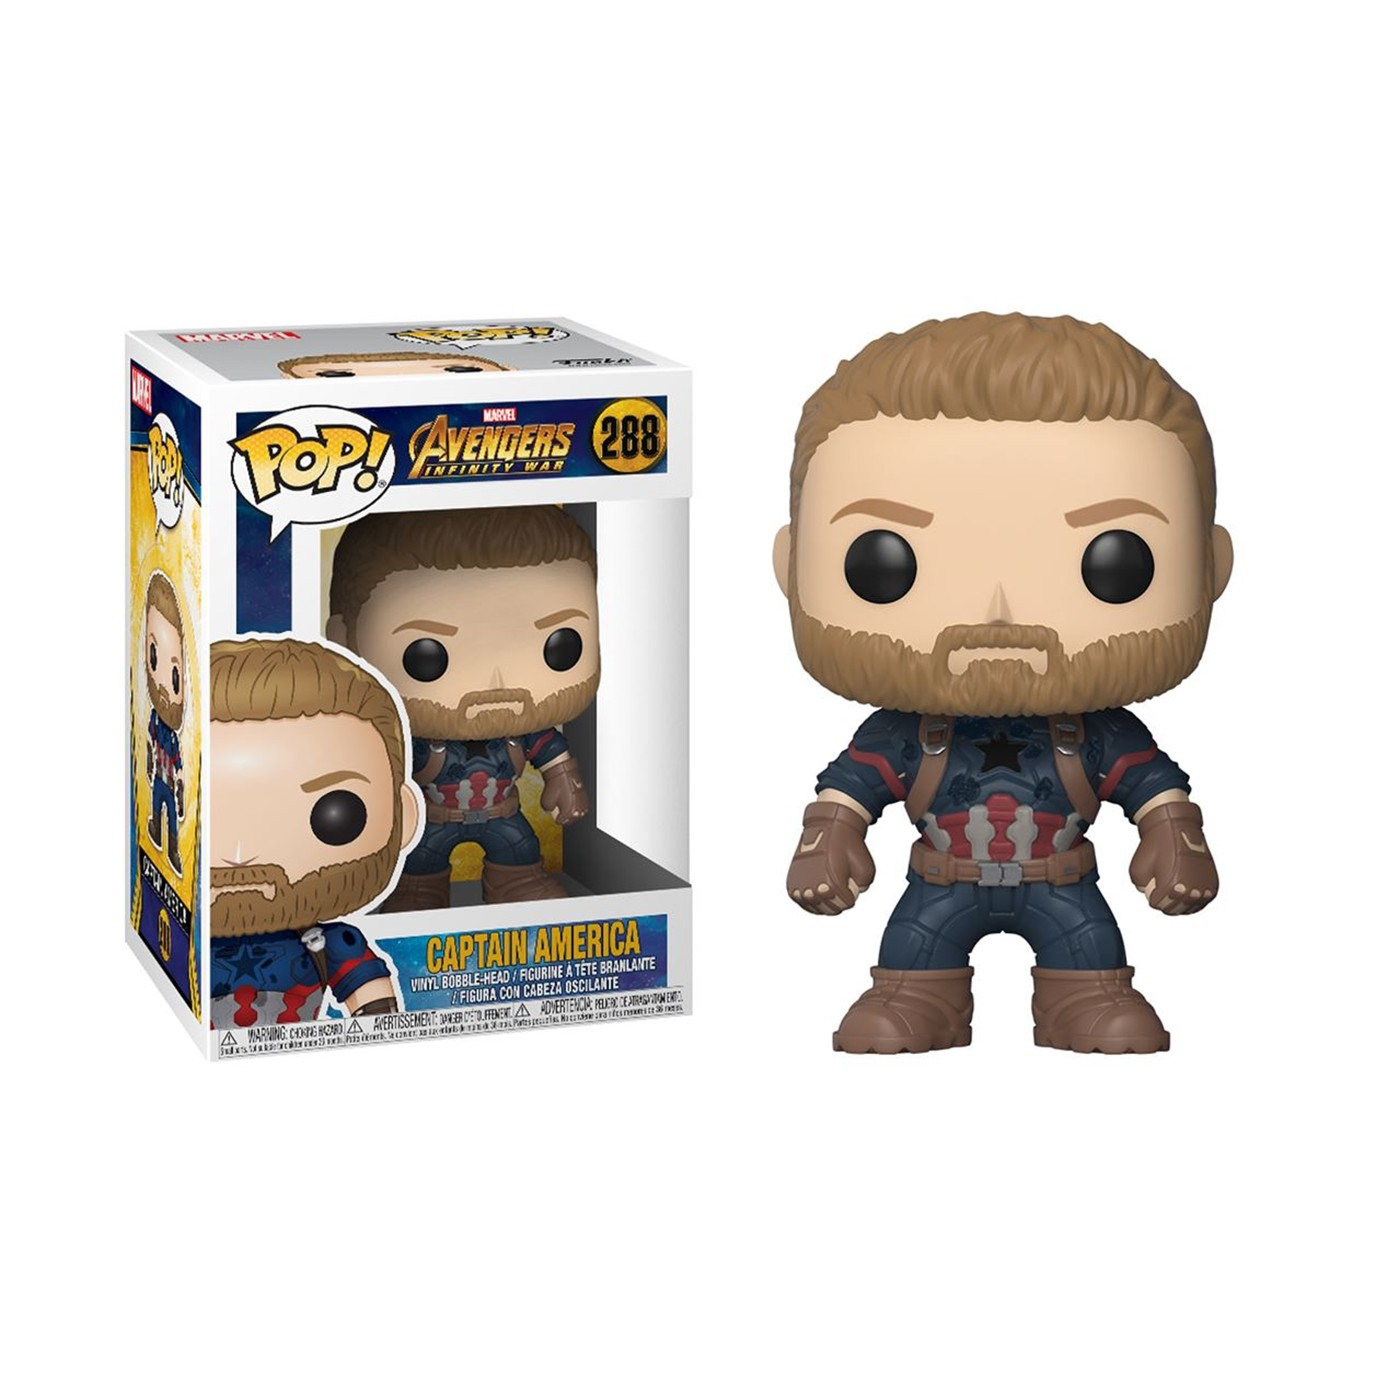 Infinity War Captain America Funko Pop Bobble Head